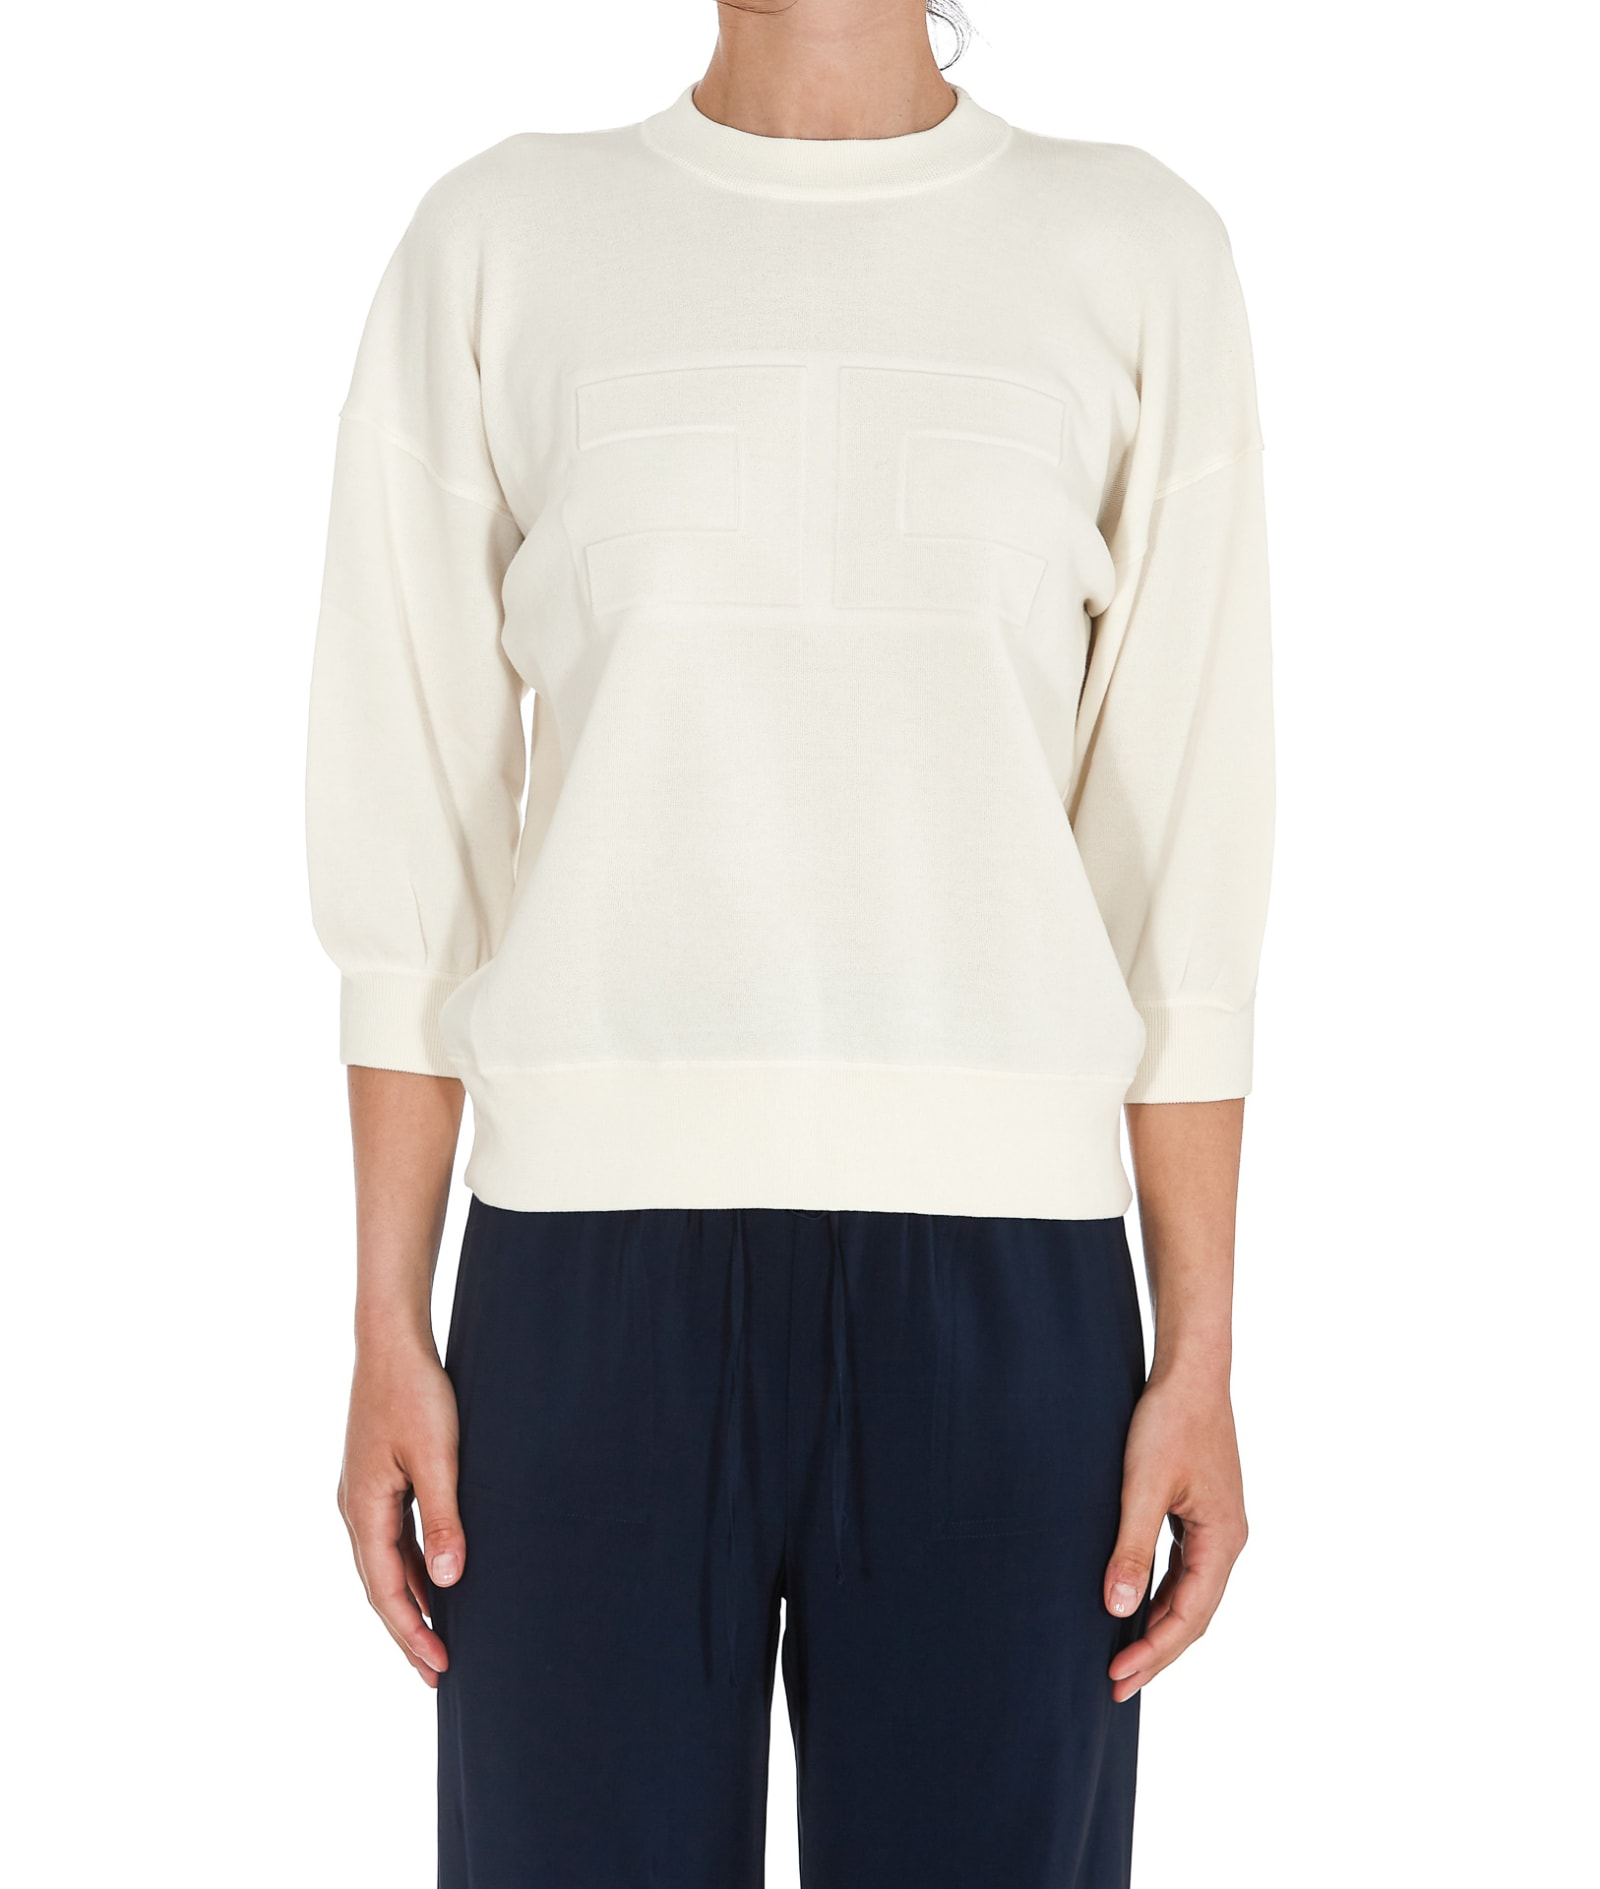 Elisabetta Franchi Sweatshirts SWEATER